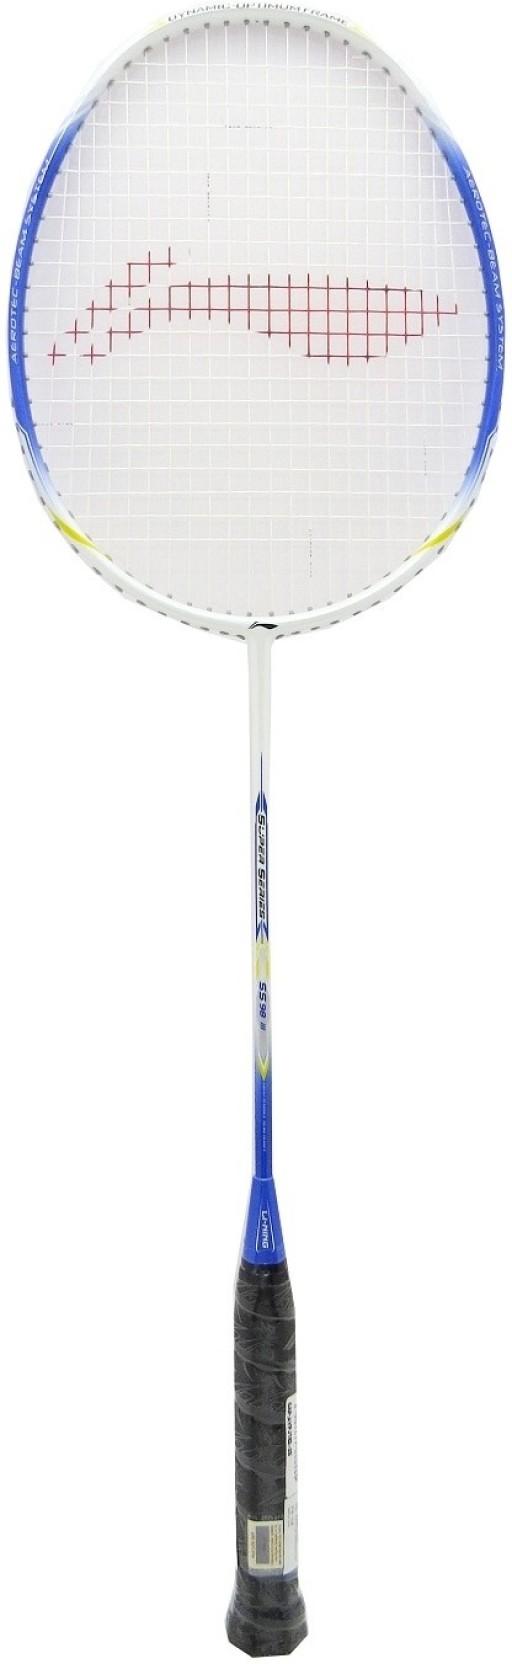 Li Ning Ss 98 Iii Blue White Strung Badminton Racquet Buy Grip Lining Gp 34a Original Add To Cart